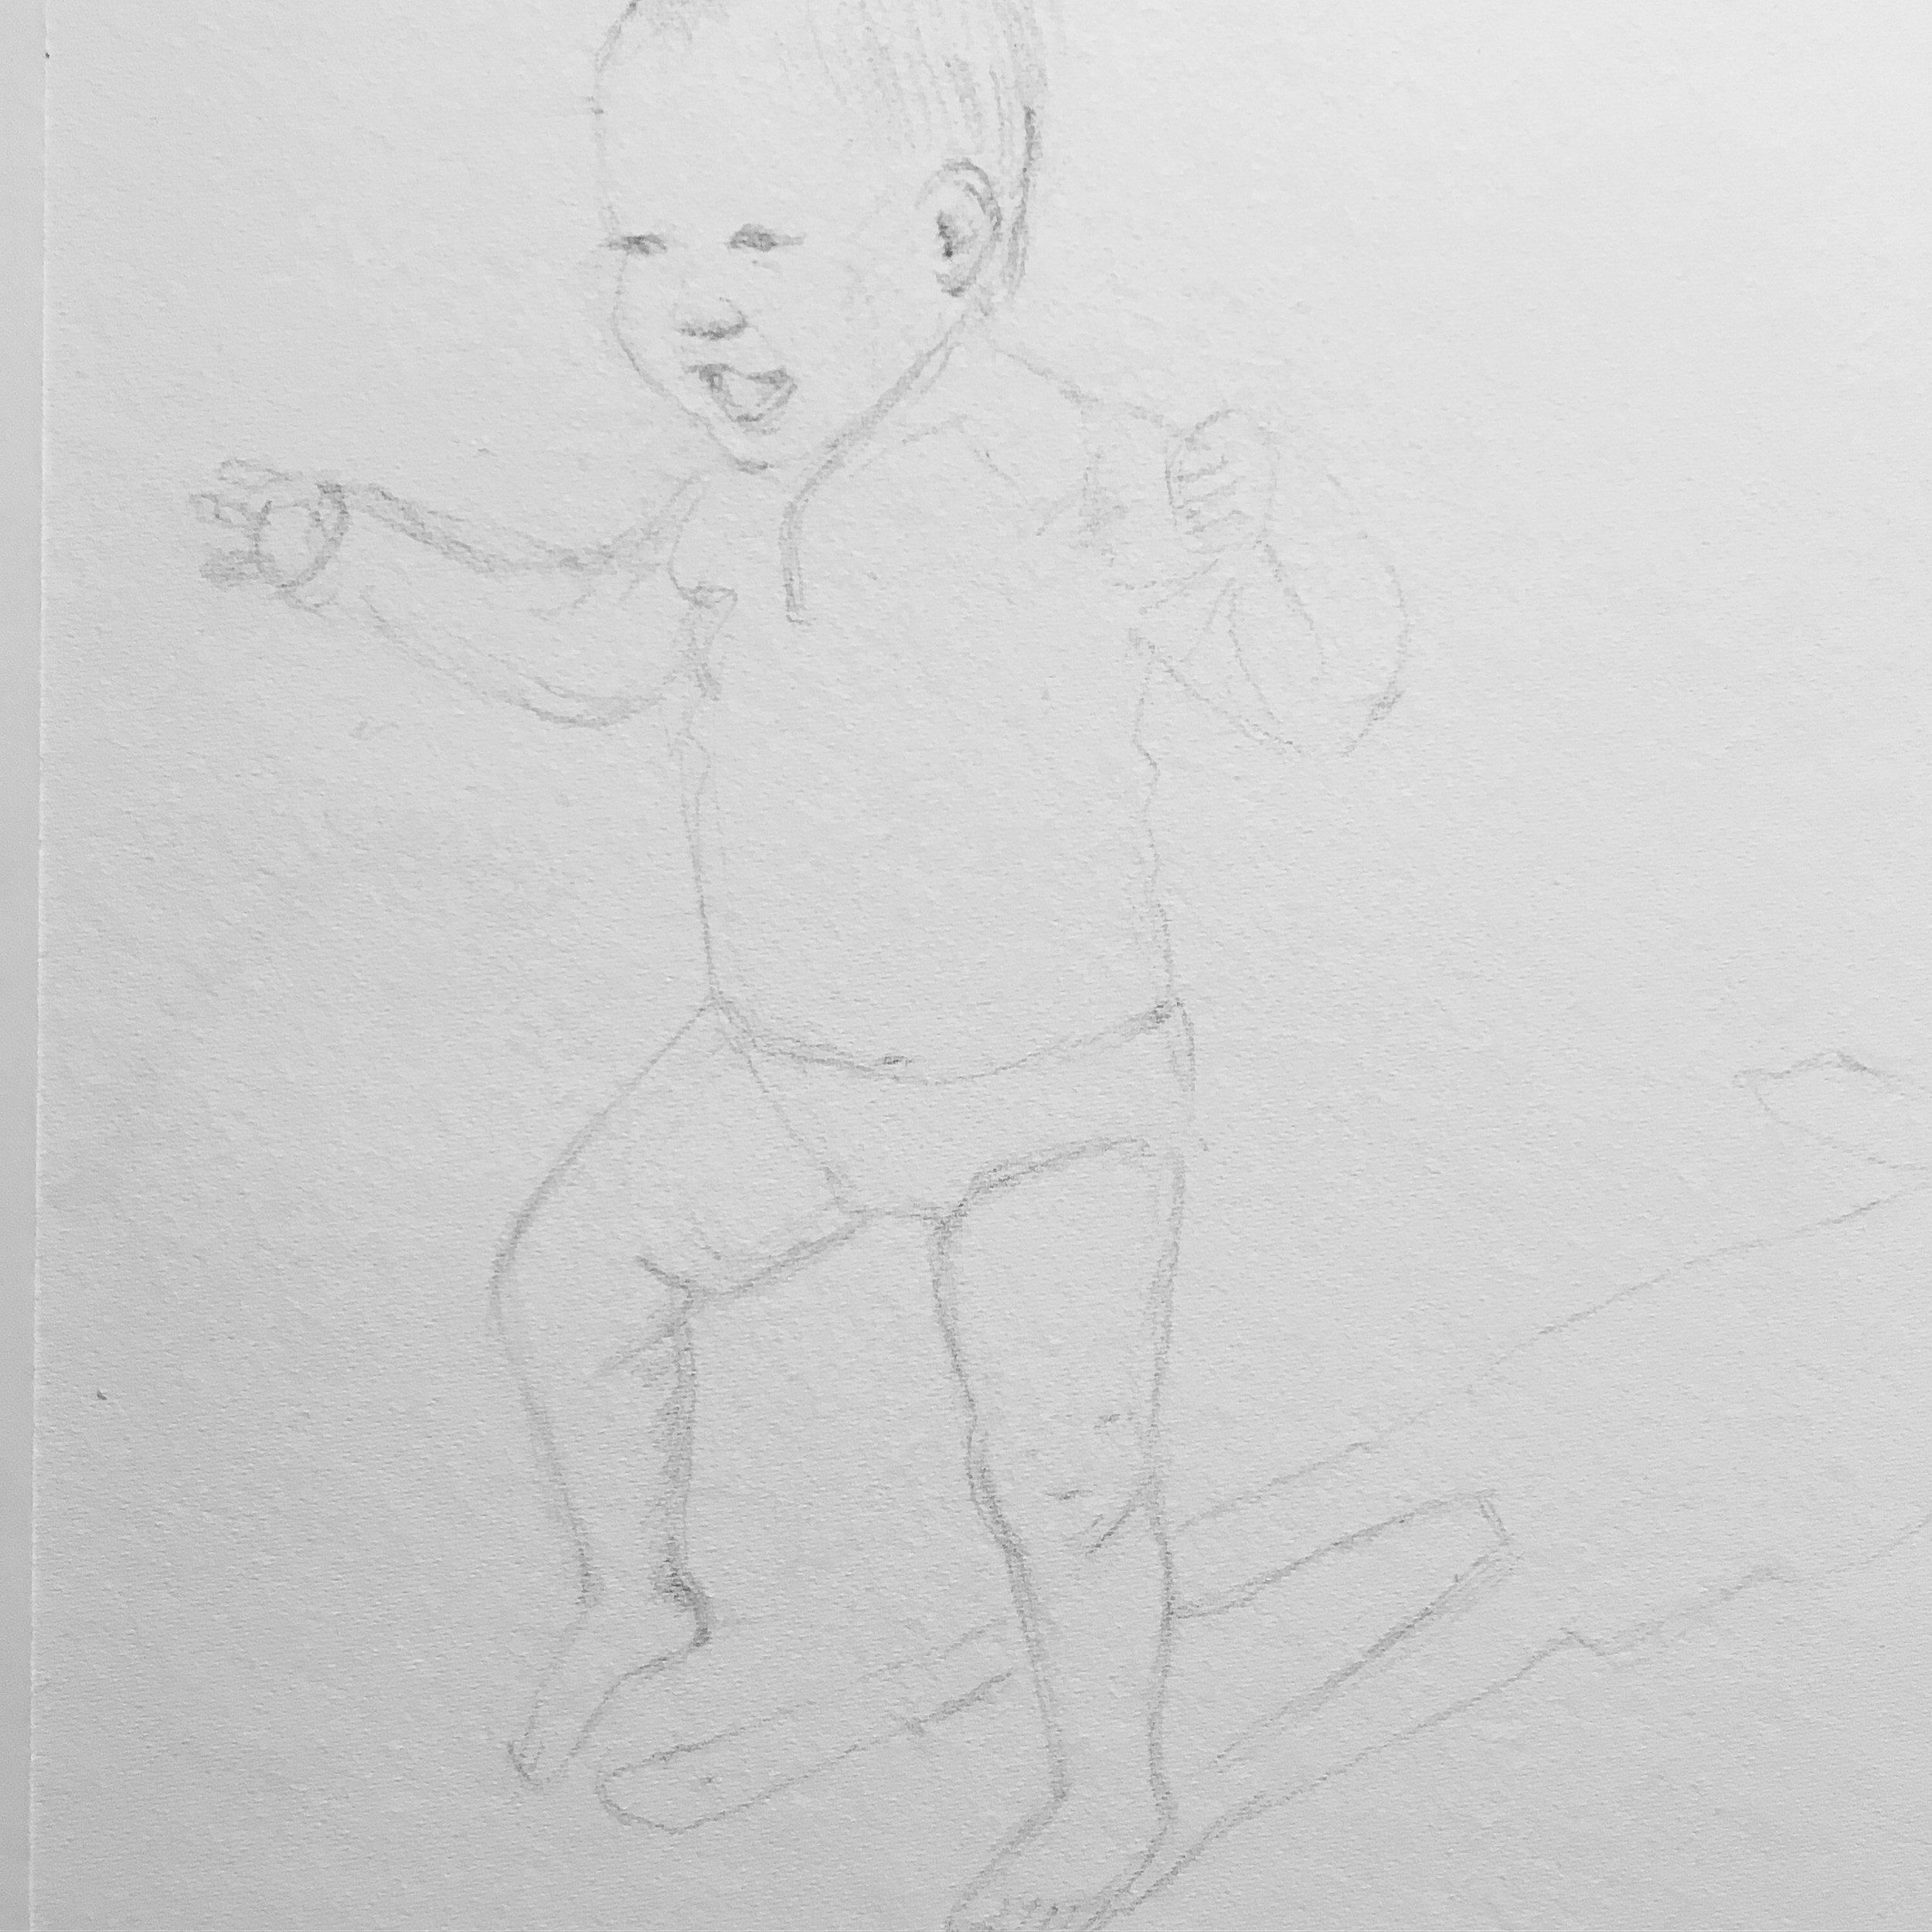 BabyRyan_sketch©PamBaumeister.JPG